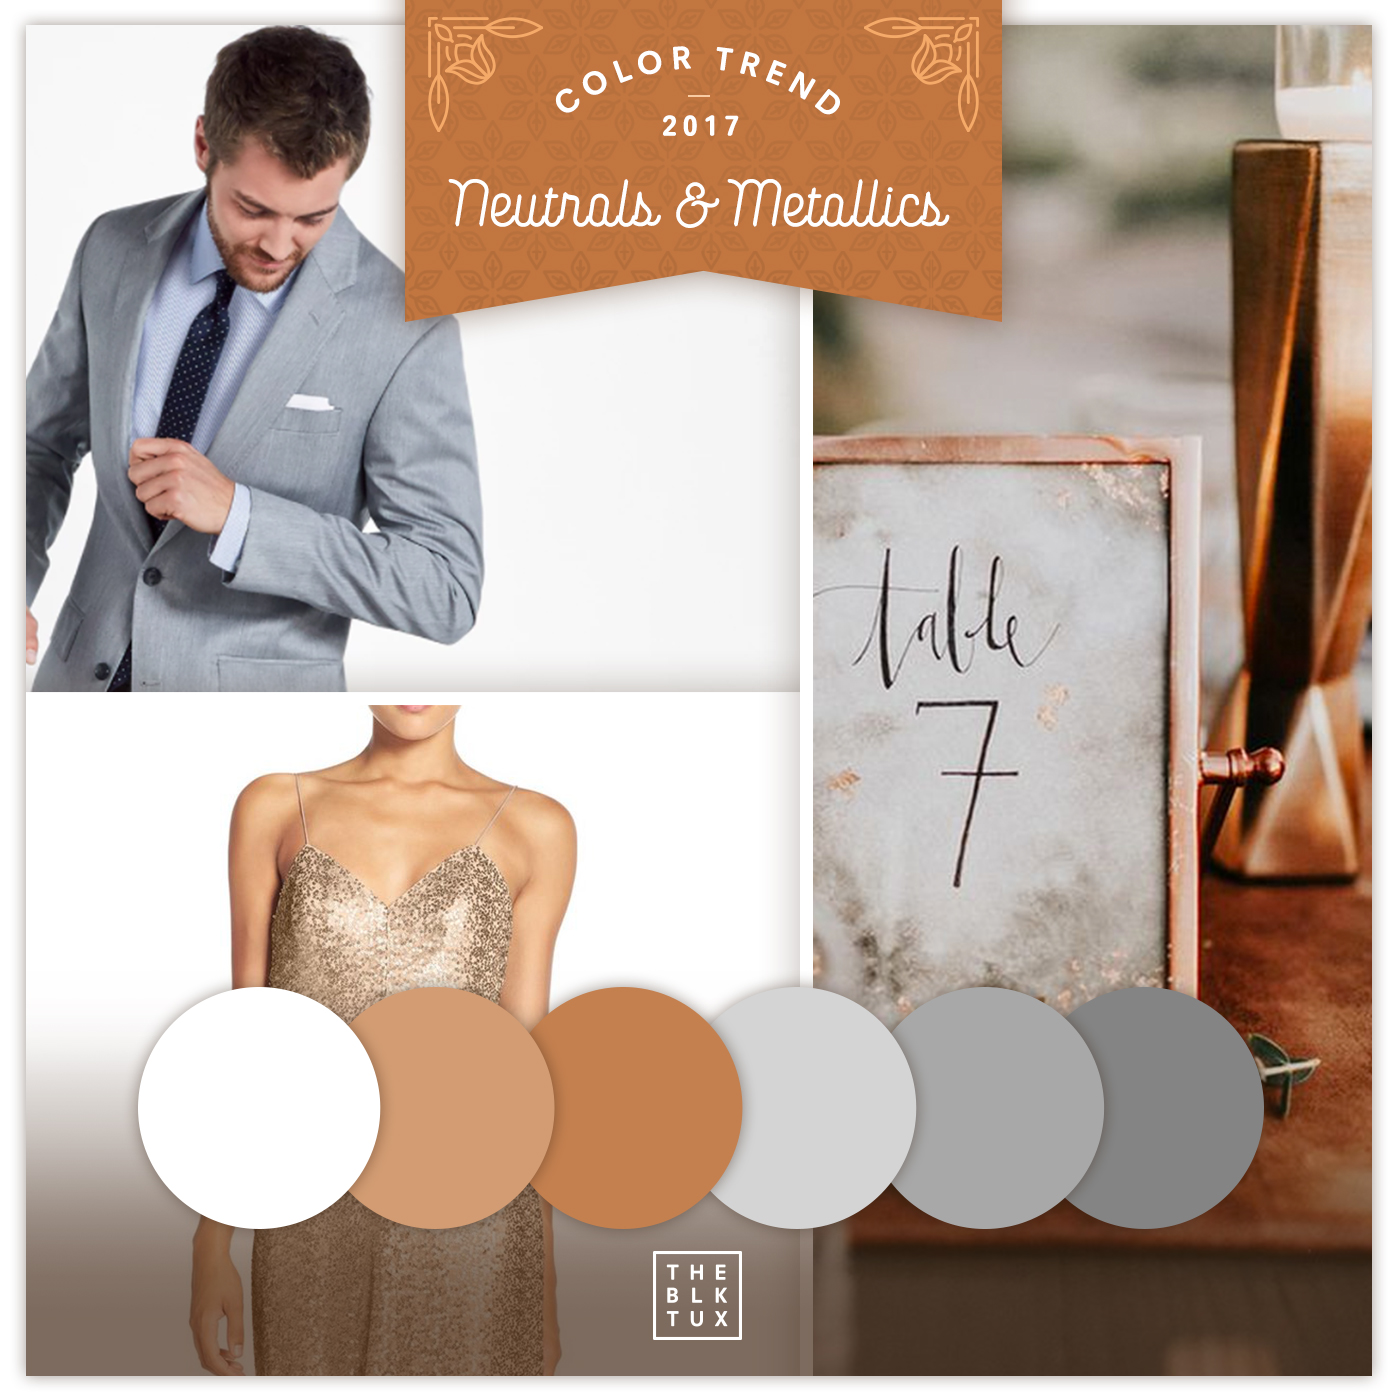 blktux_wedding_color_trends_neutrals_x2.jpg